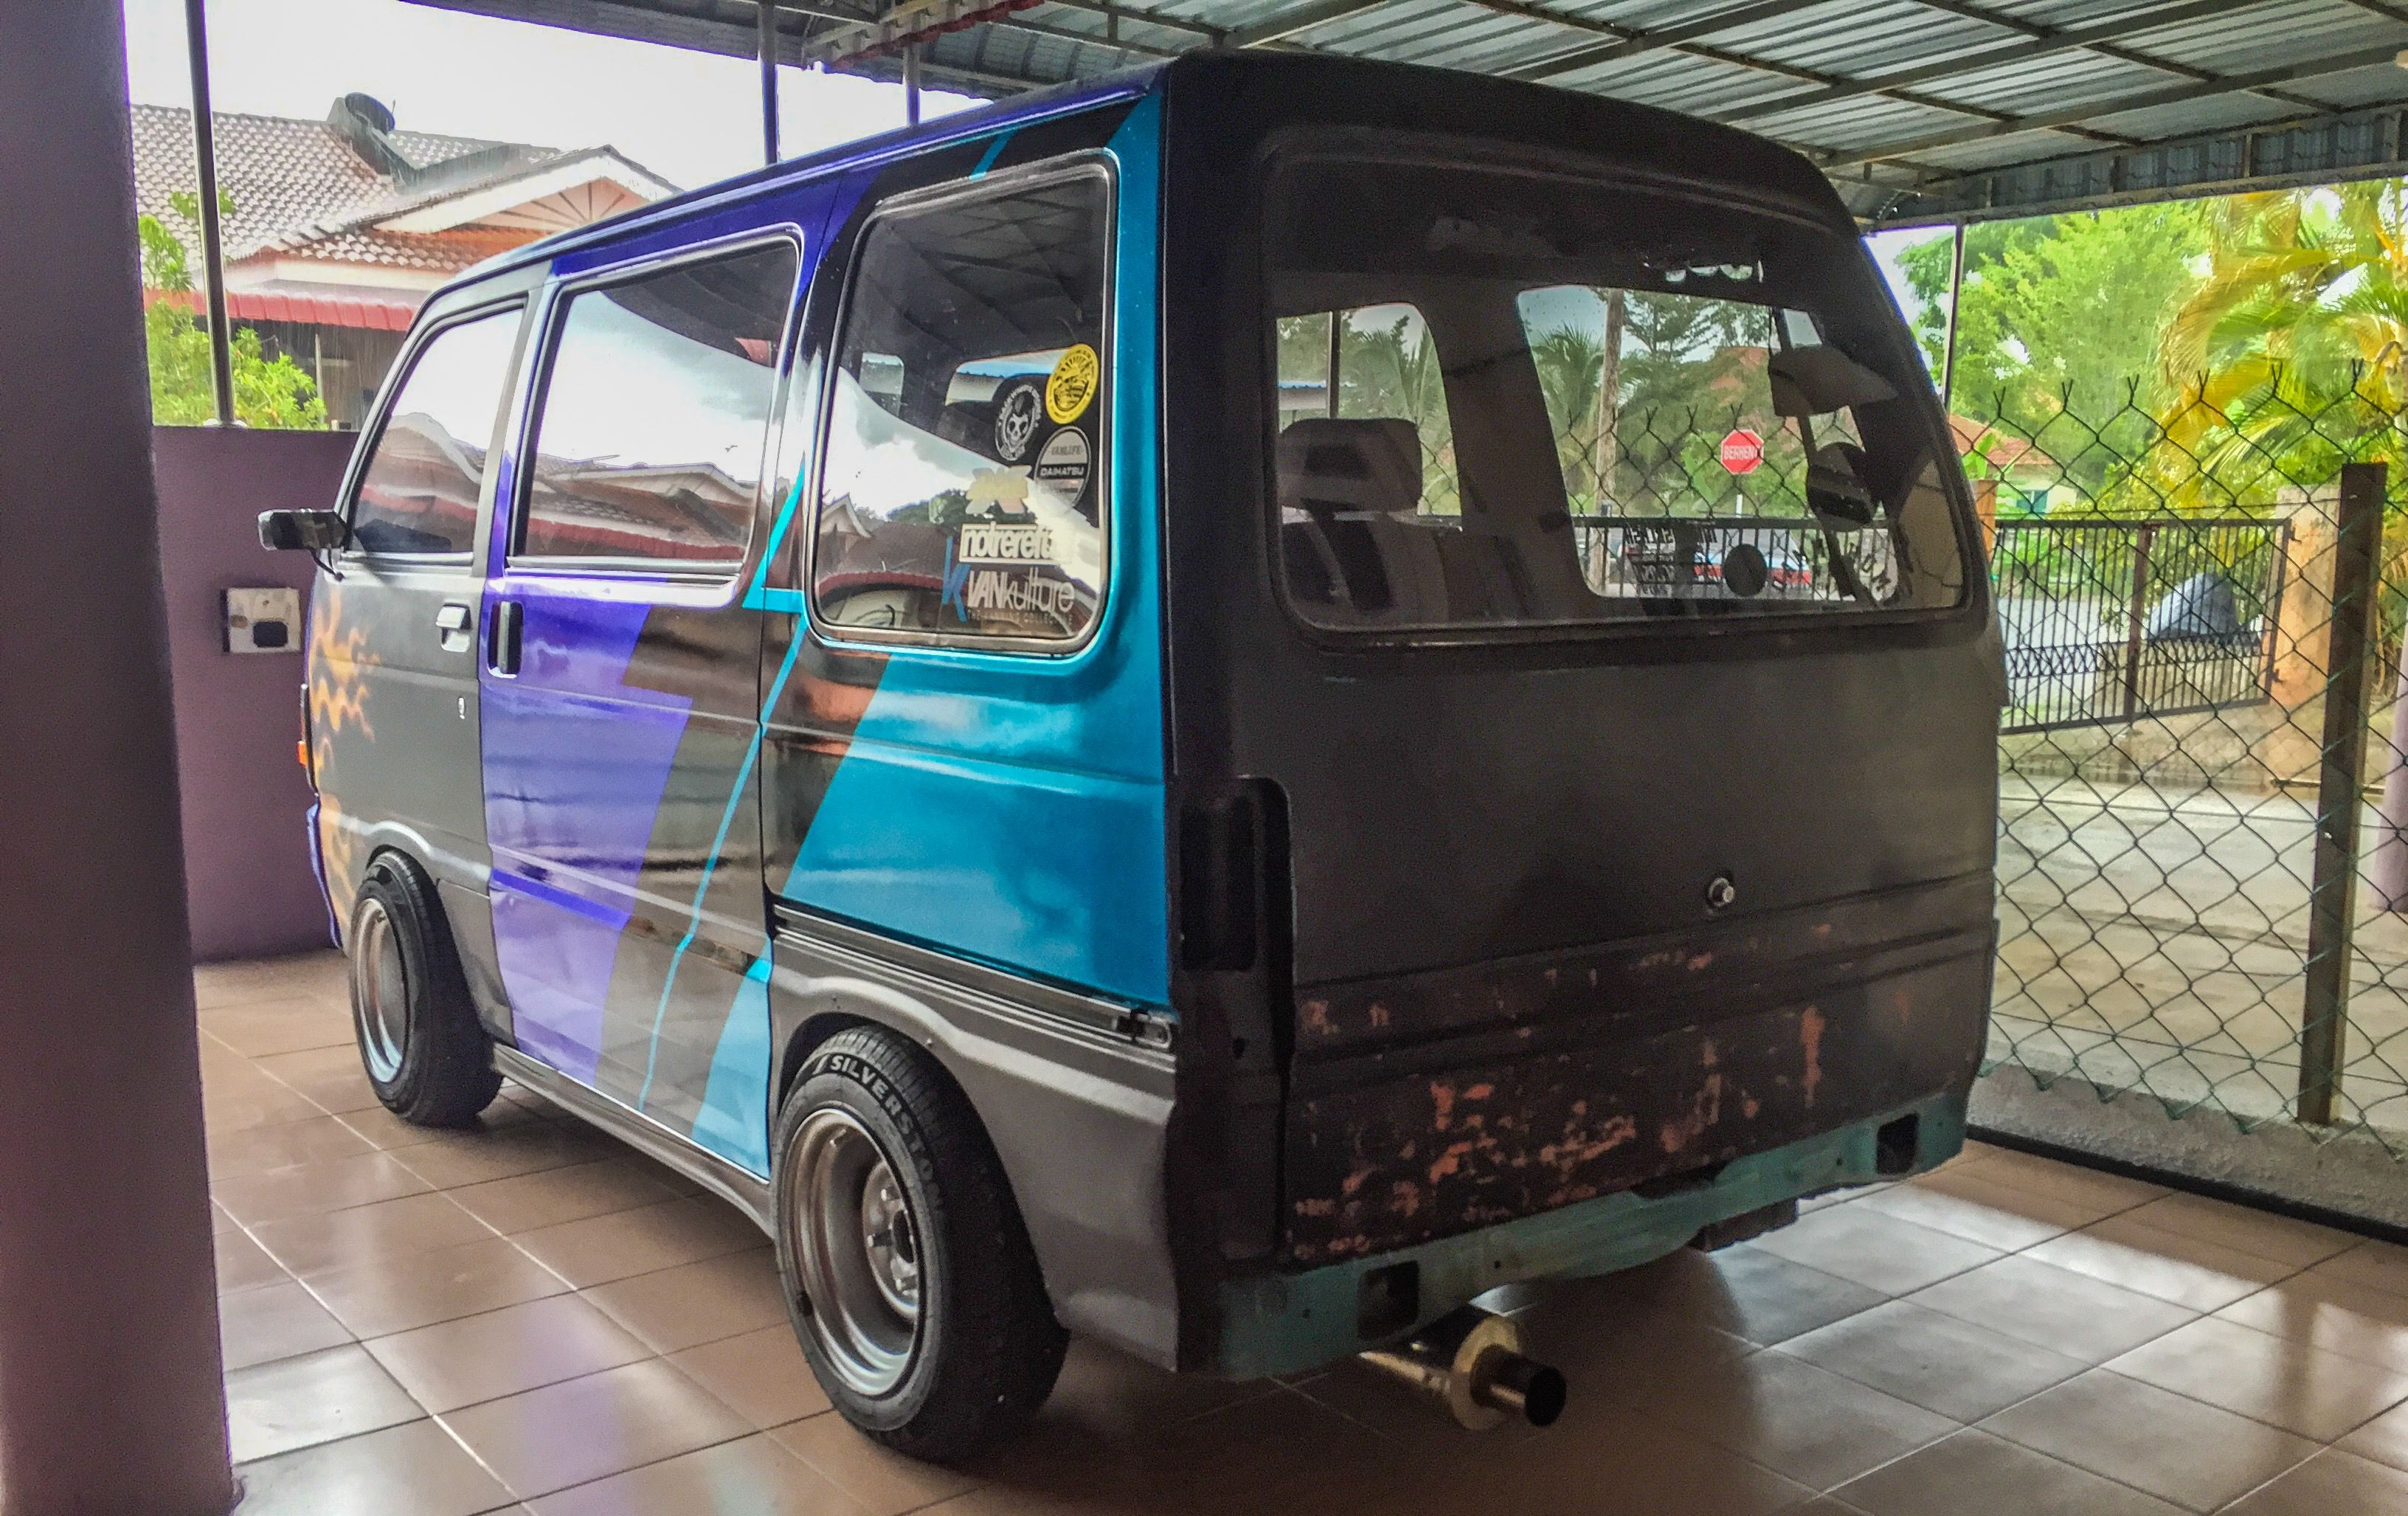 Daihatsu Hijet Maxx Blue Edition Recon Japan Compact Truck K